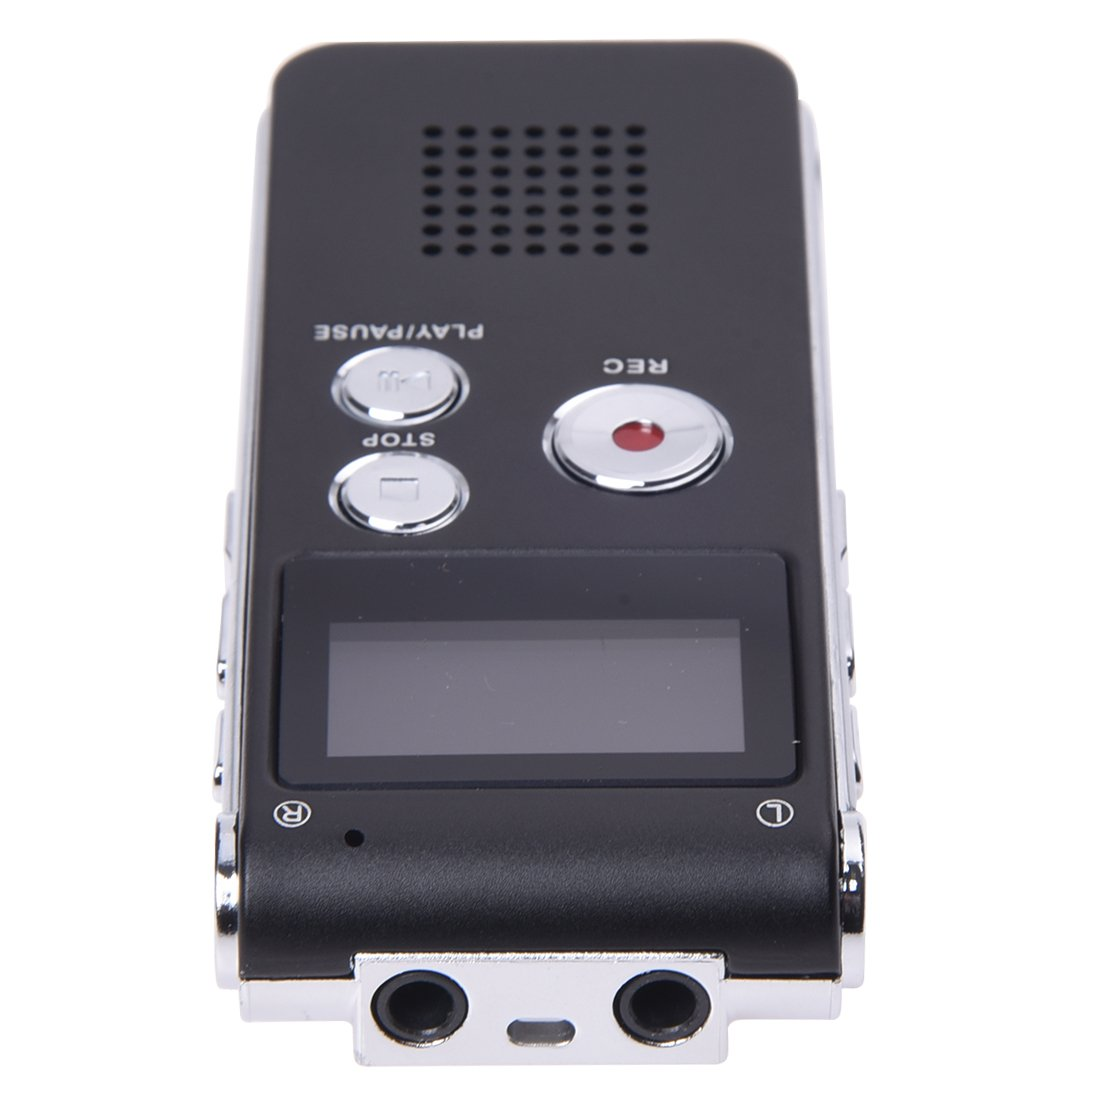 REFURBISHHOUSE 8GB LCD 650Hr Audio Numerique Enregistreur Dictaphone MP3 Rechargeable Espion